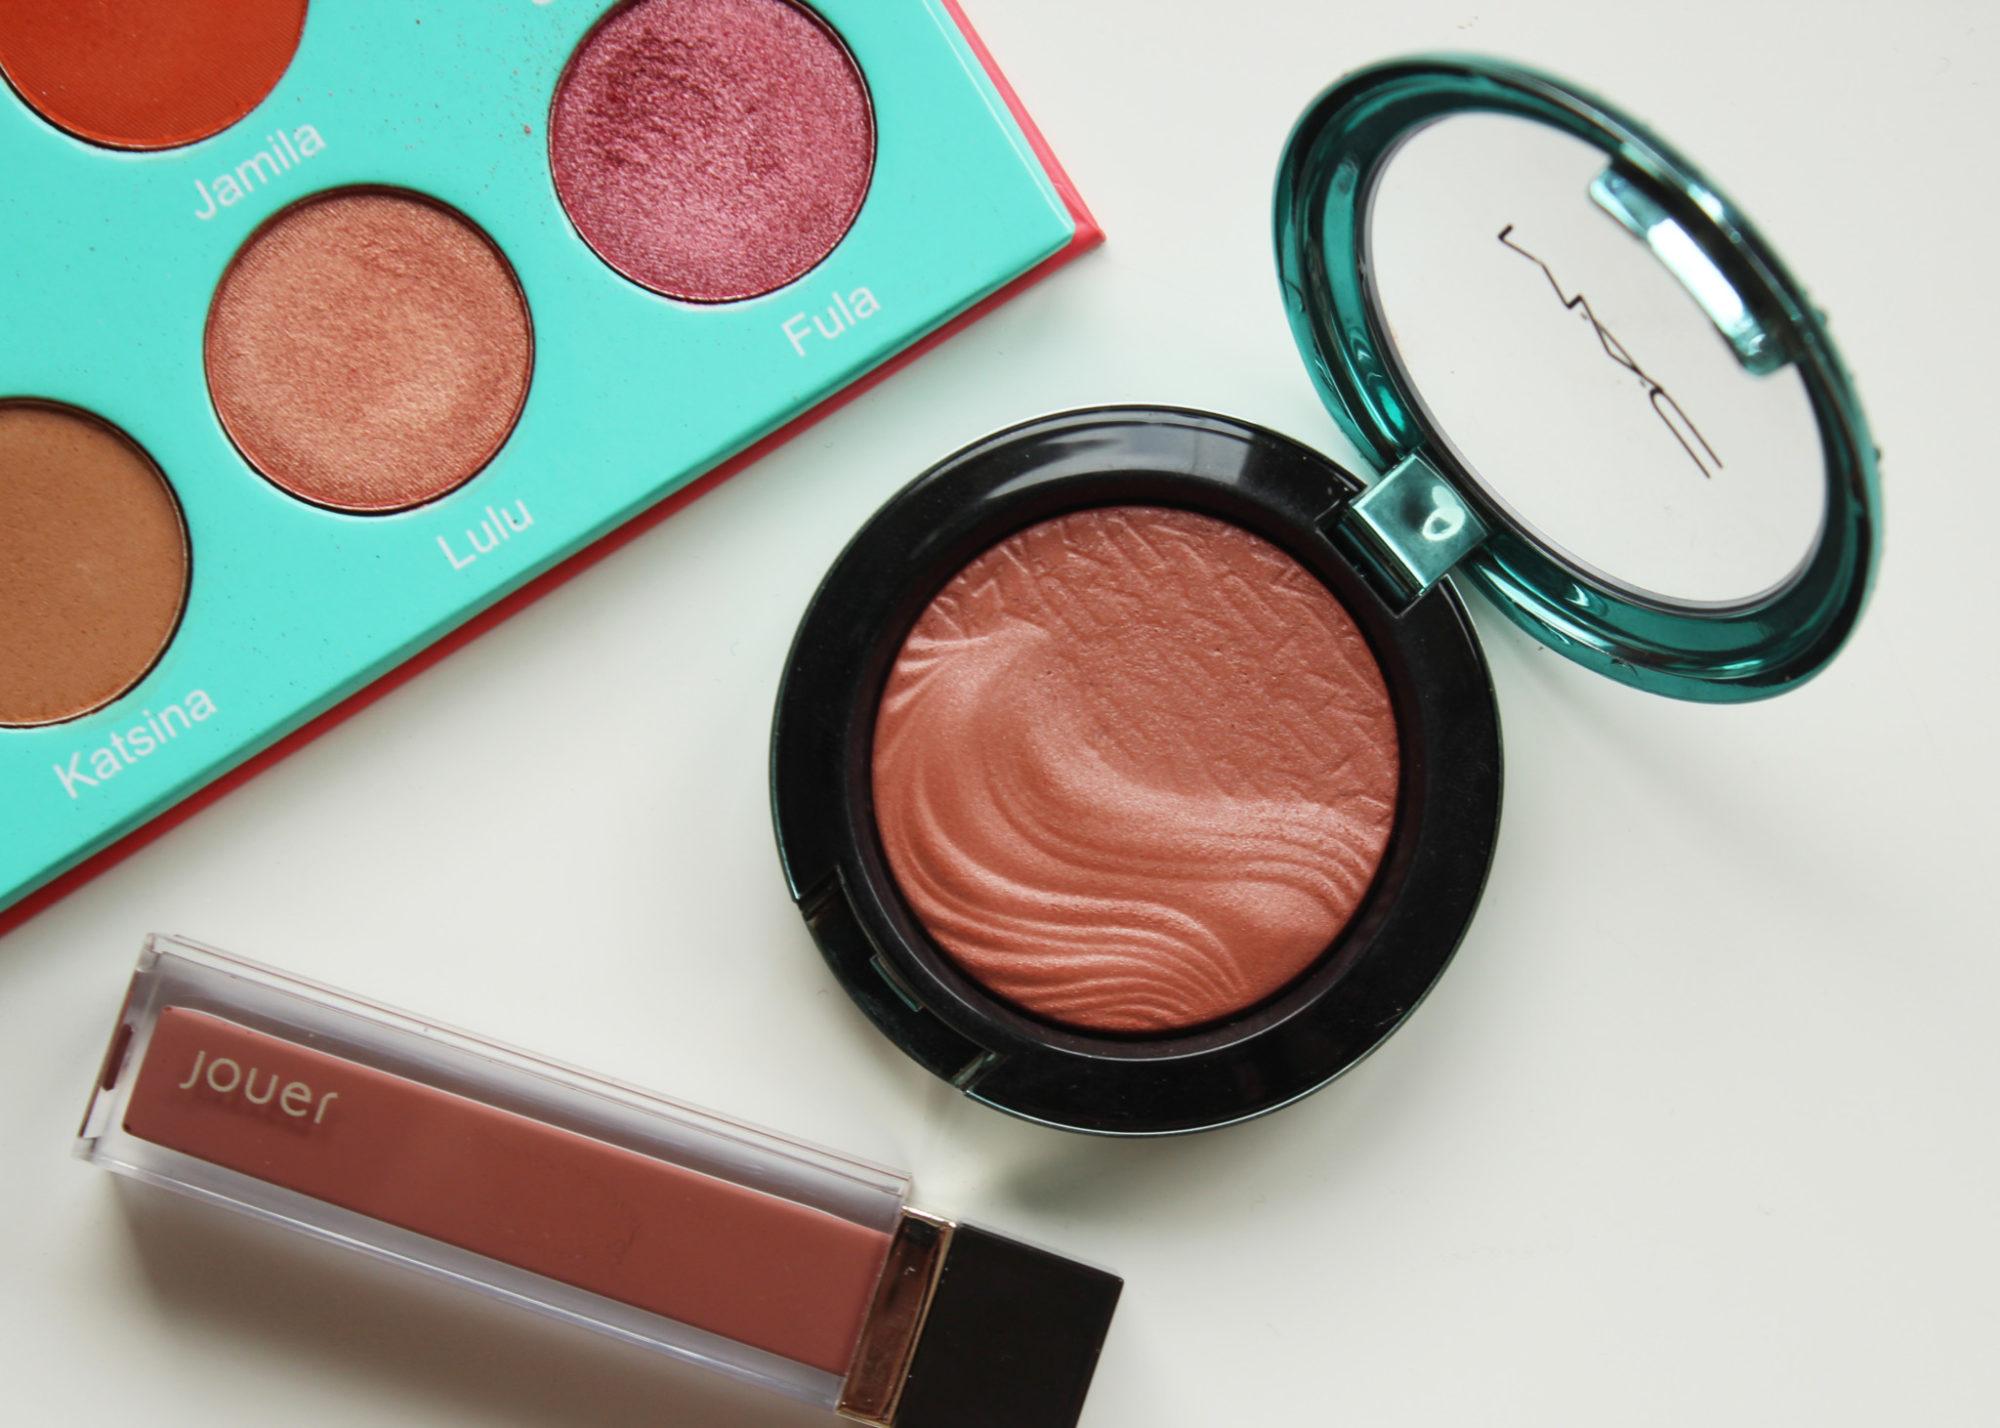 Veckans topp 3 med Juvia's Place, MAC och Jouer Cosmetics